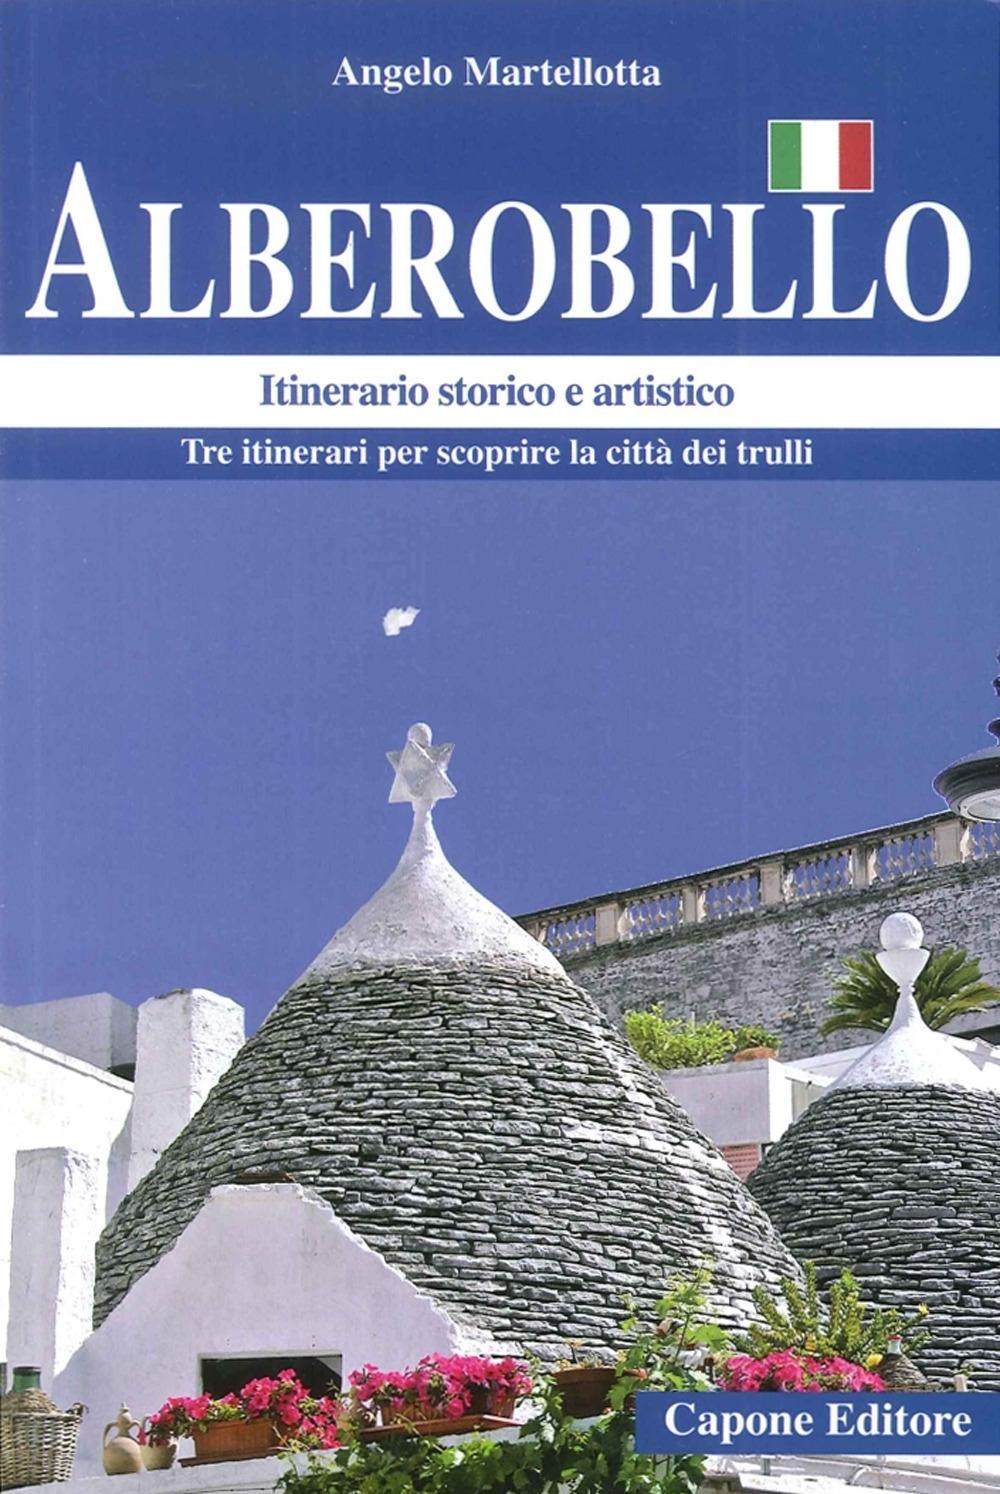 Alberobello. Itinerario Storico e Artistico.